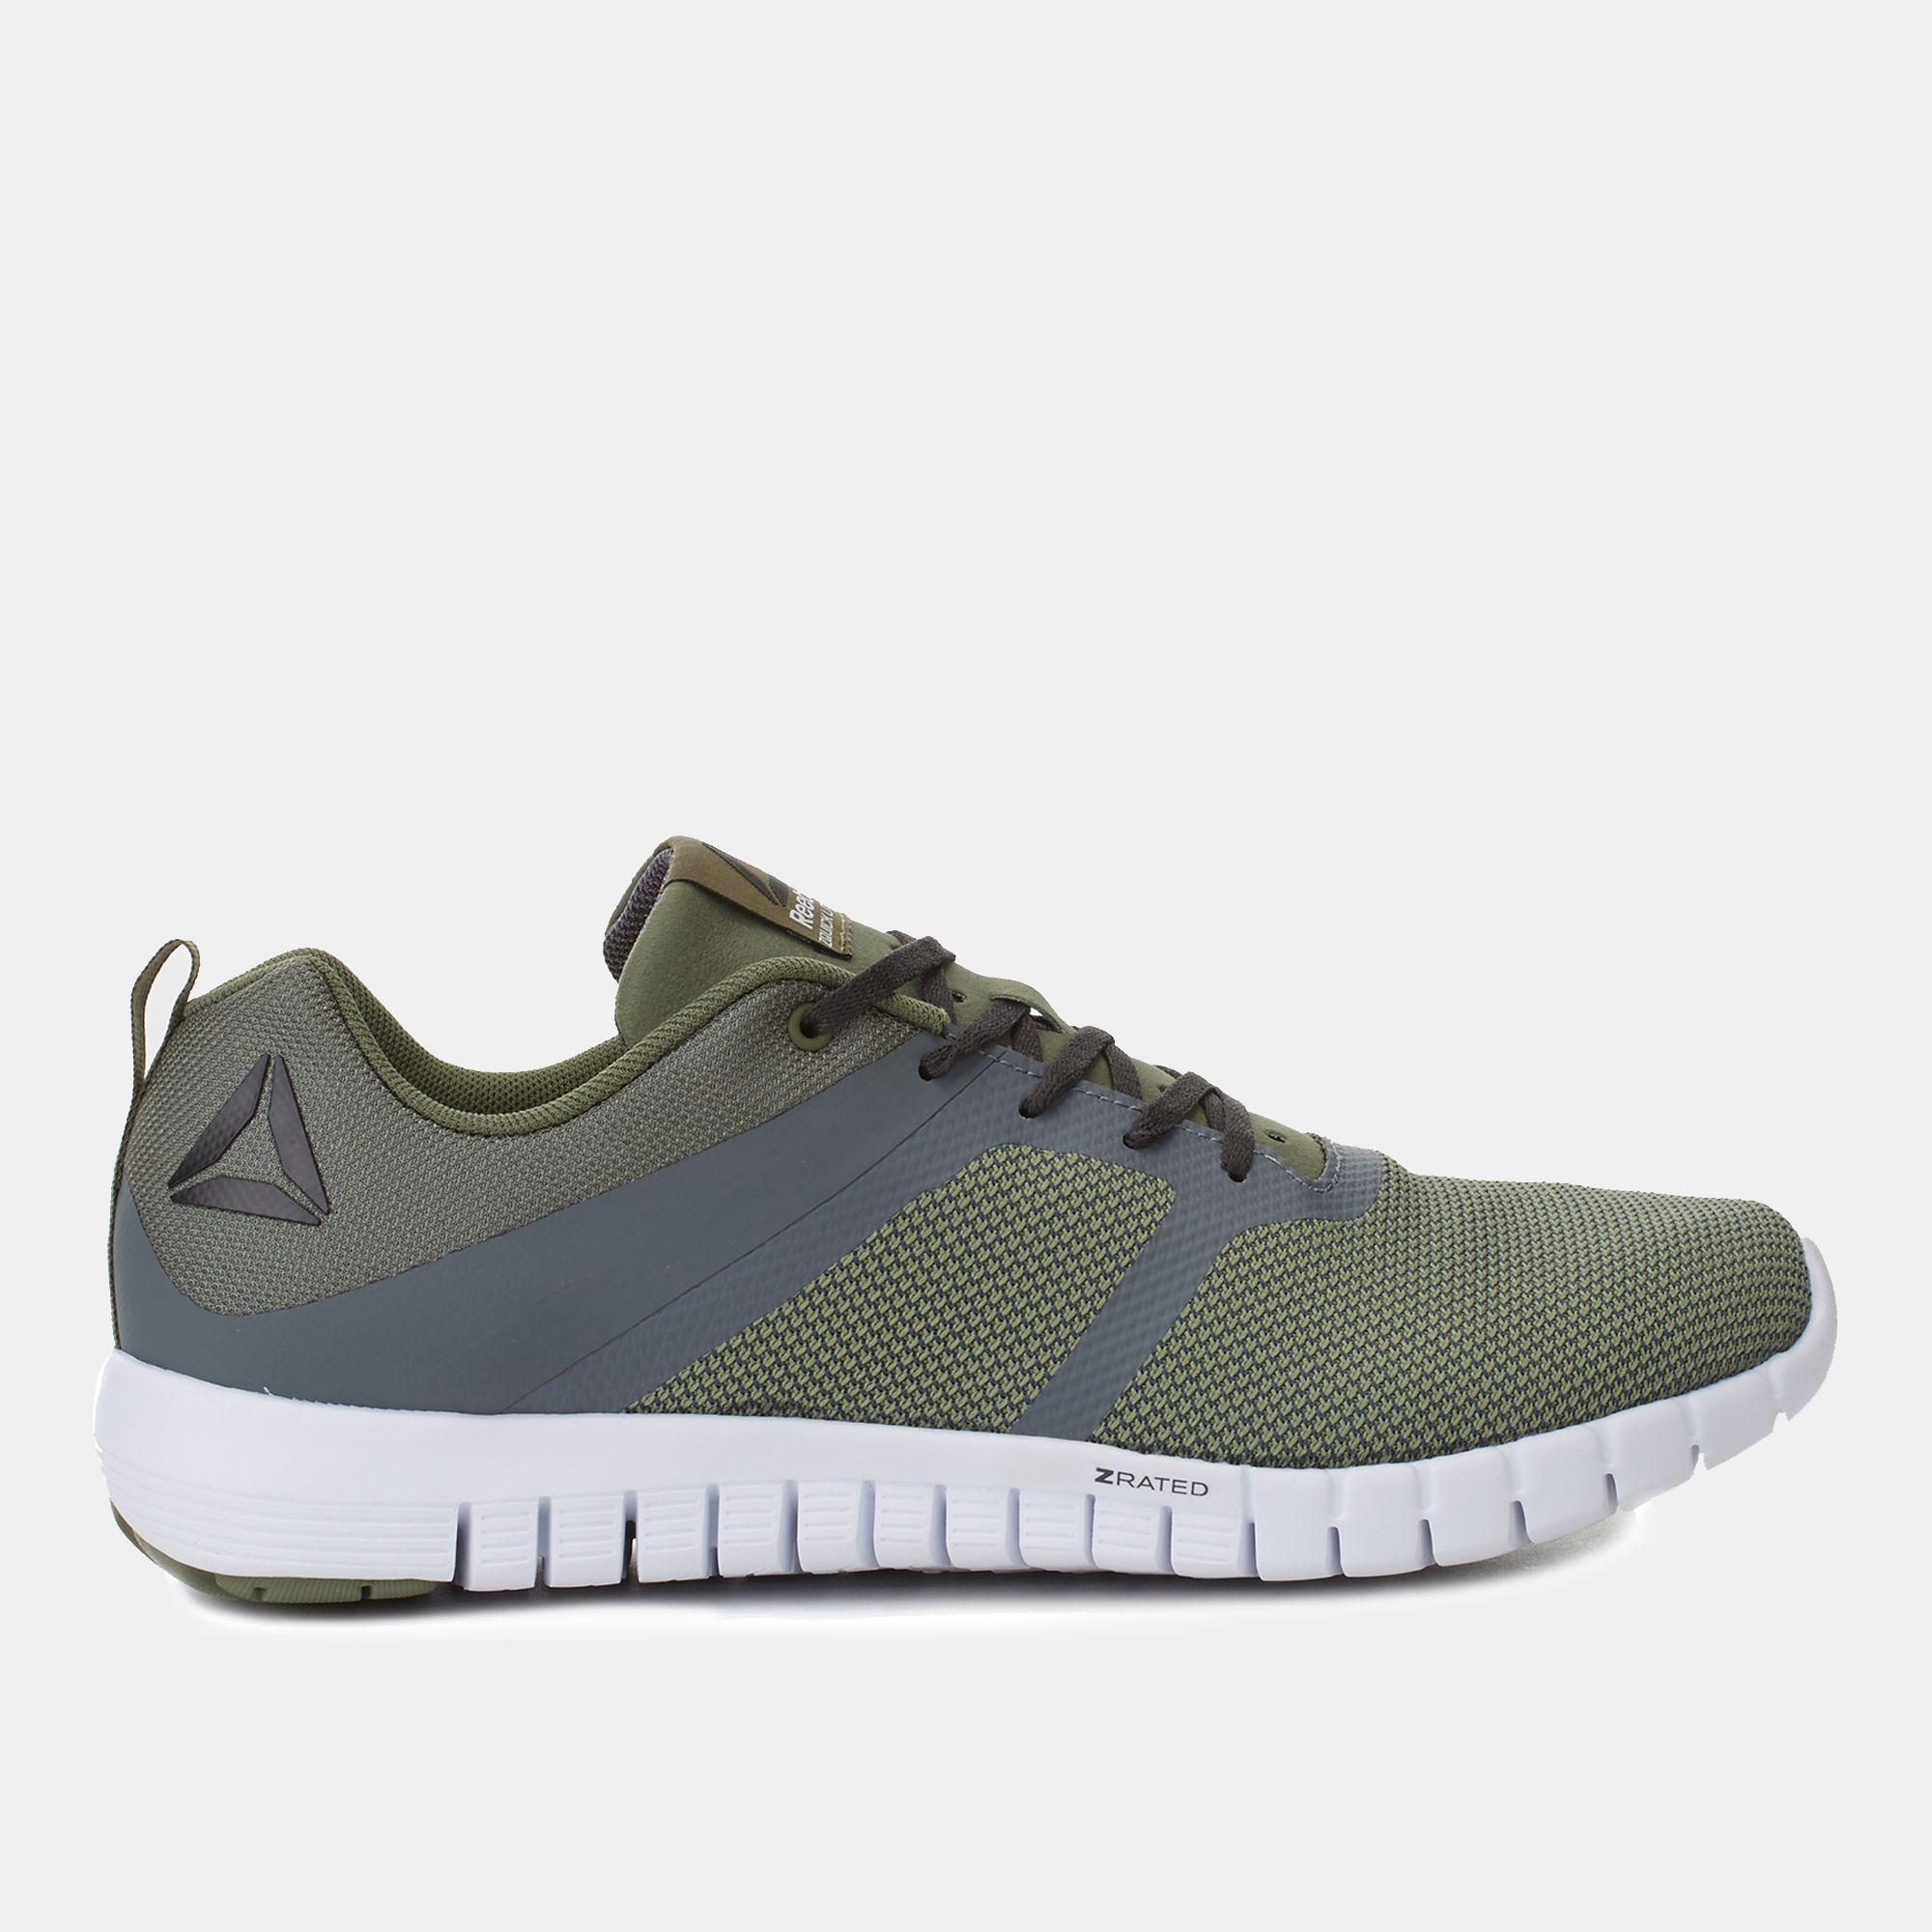 78177c39d004 Shop Green Reebok ZQuick Lite 2.0 Shoe for Mens by Reebok